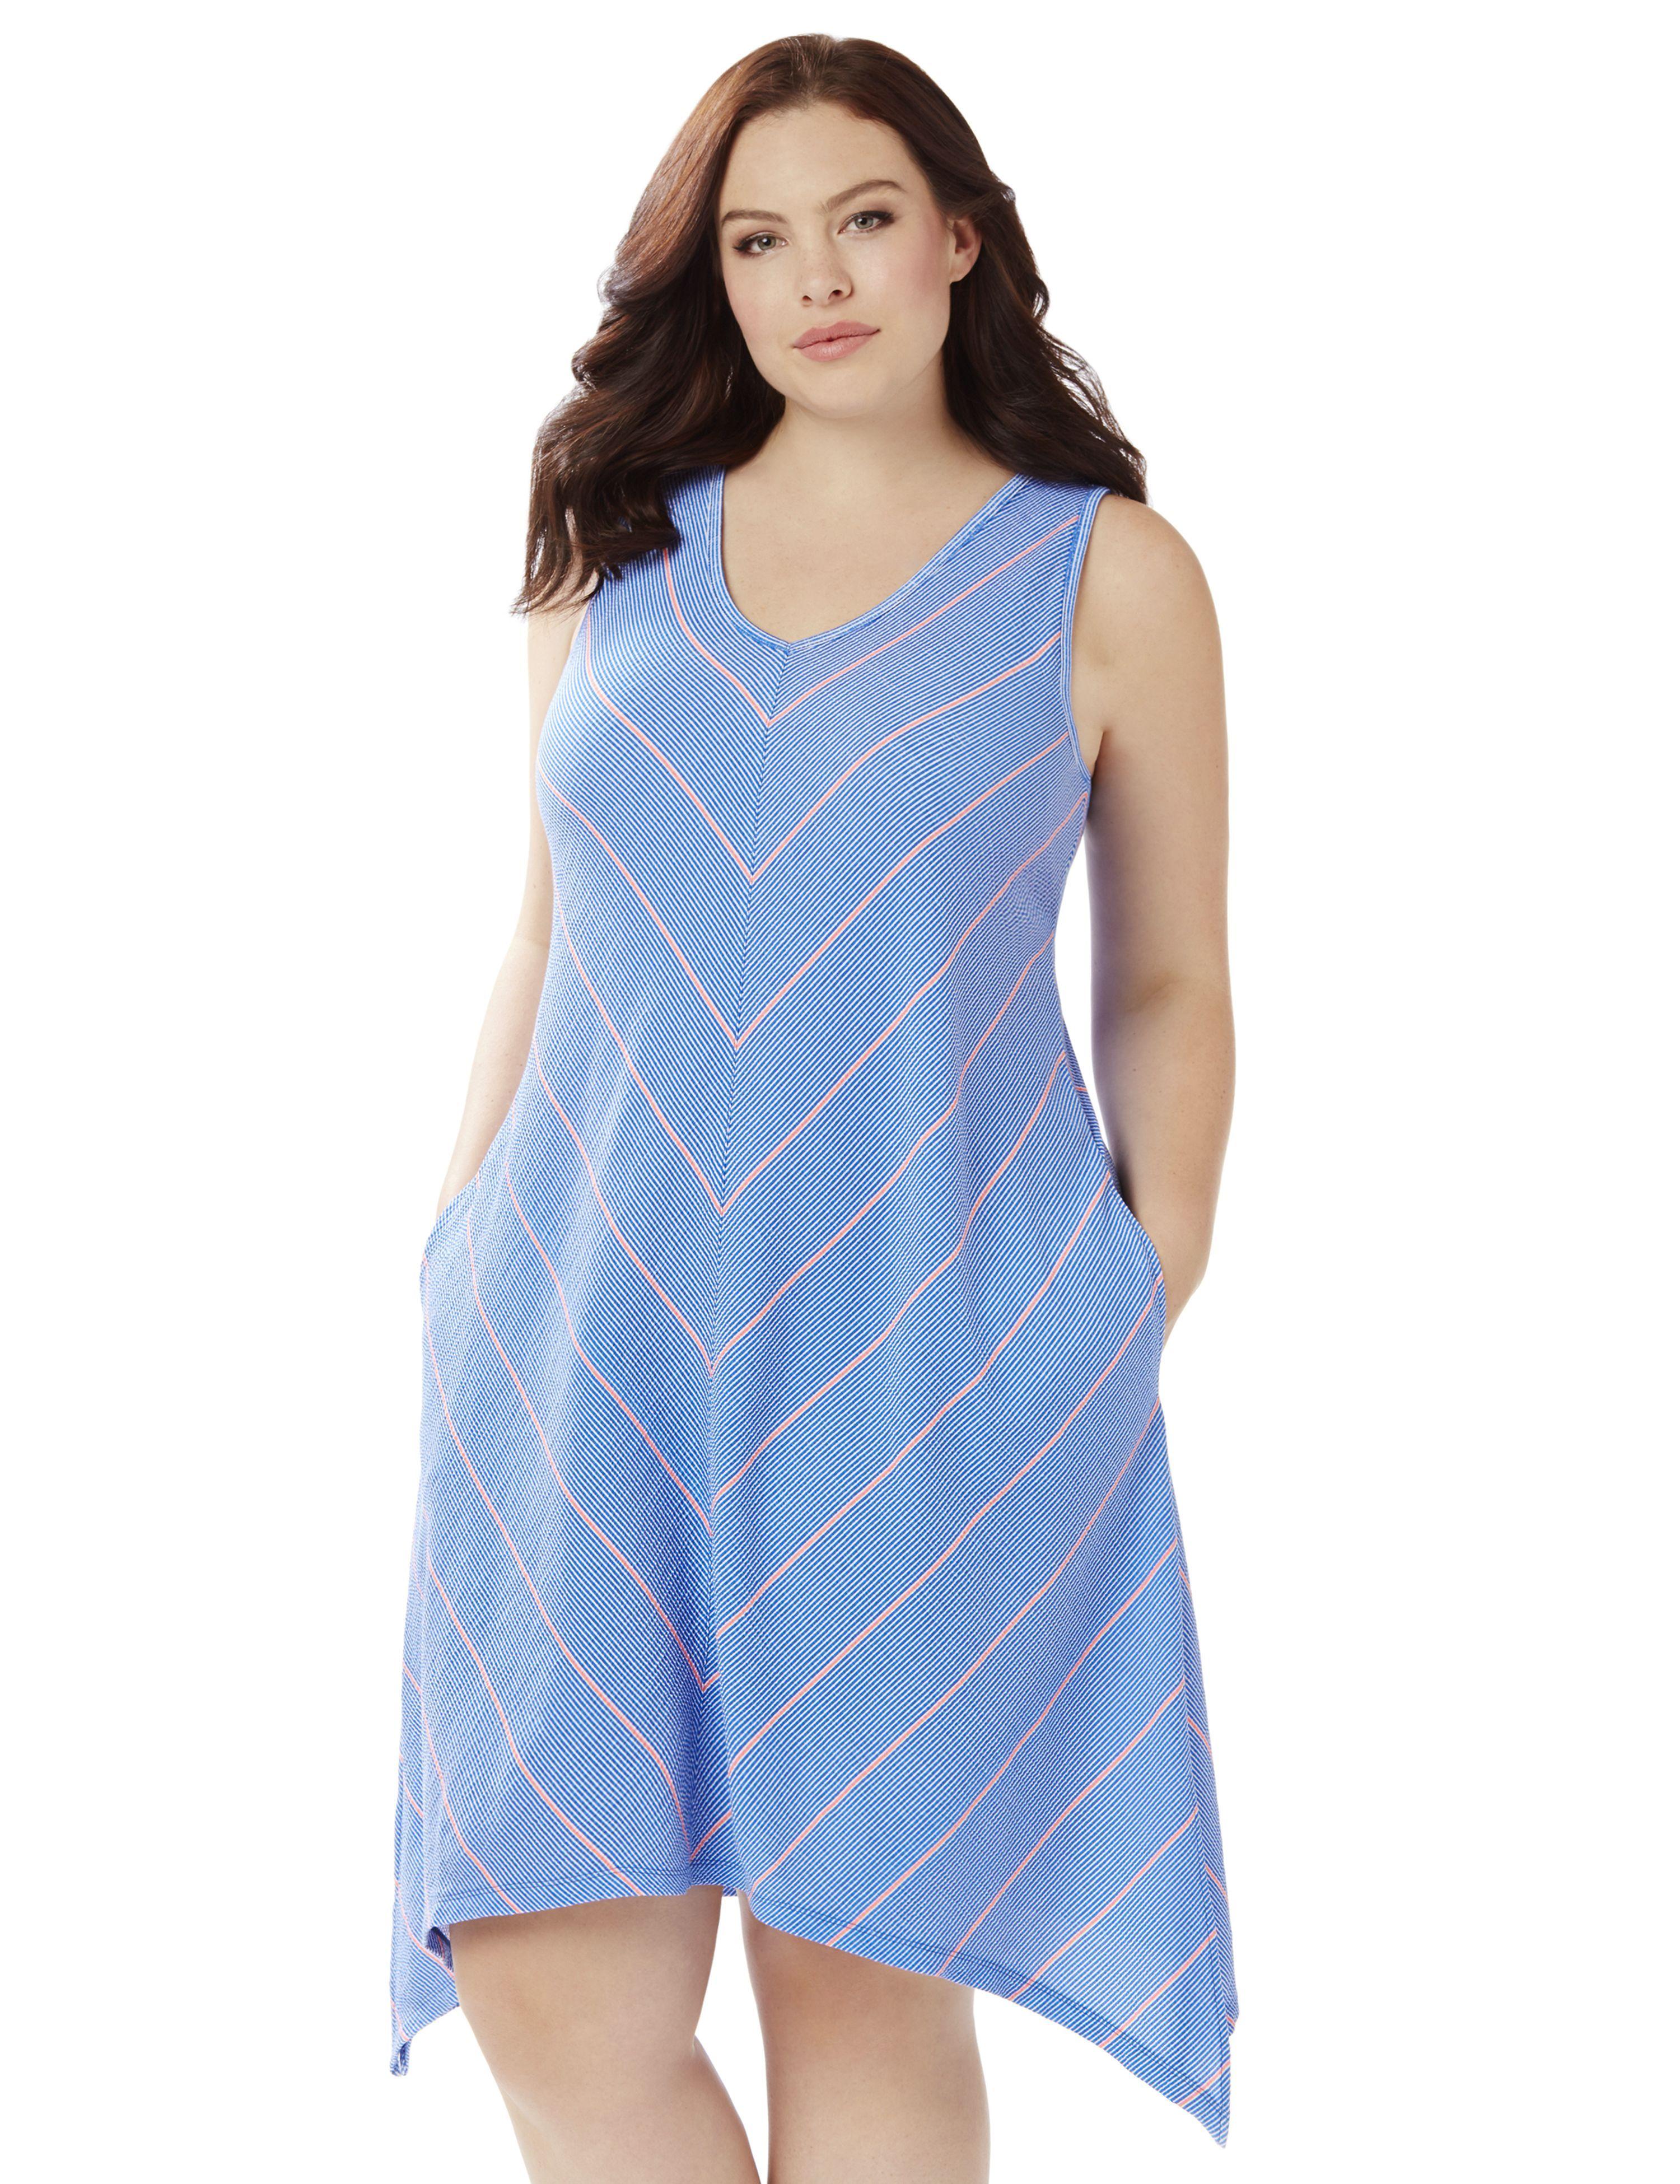 Chevron Sleep Gown   Georgia Pratt (Catherines)   Pinterest   Gowns ...